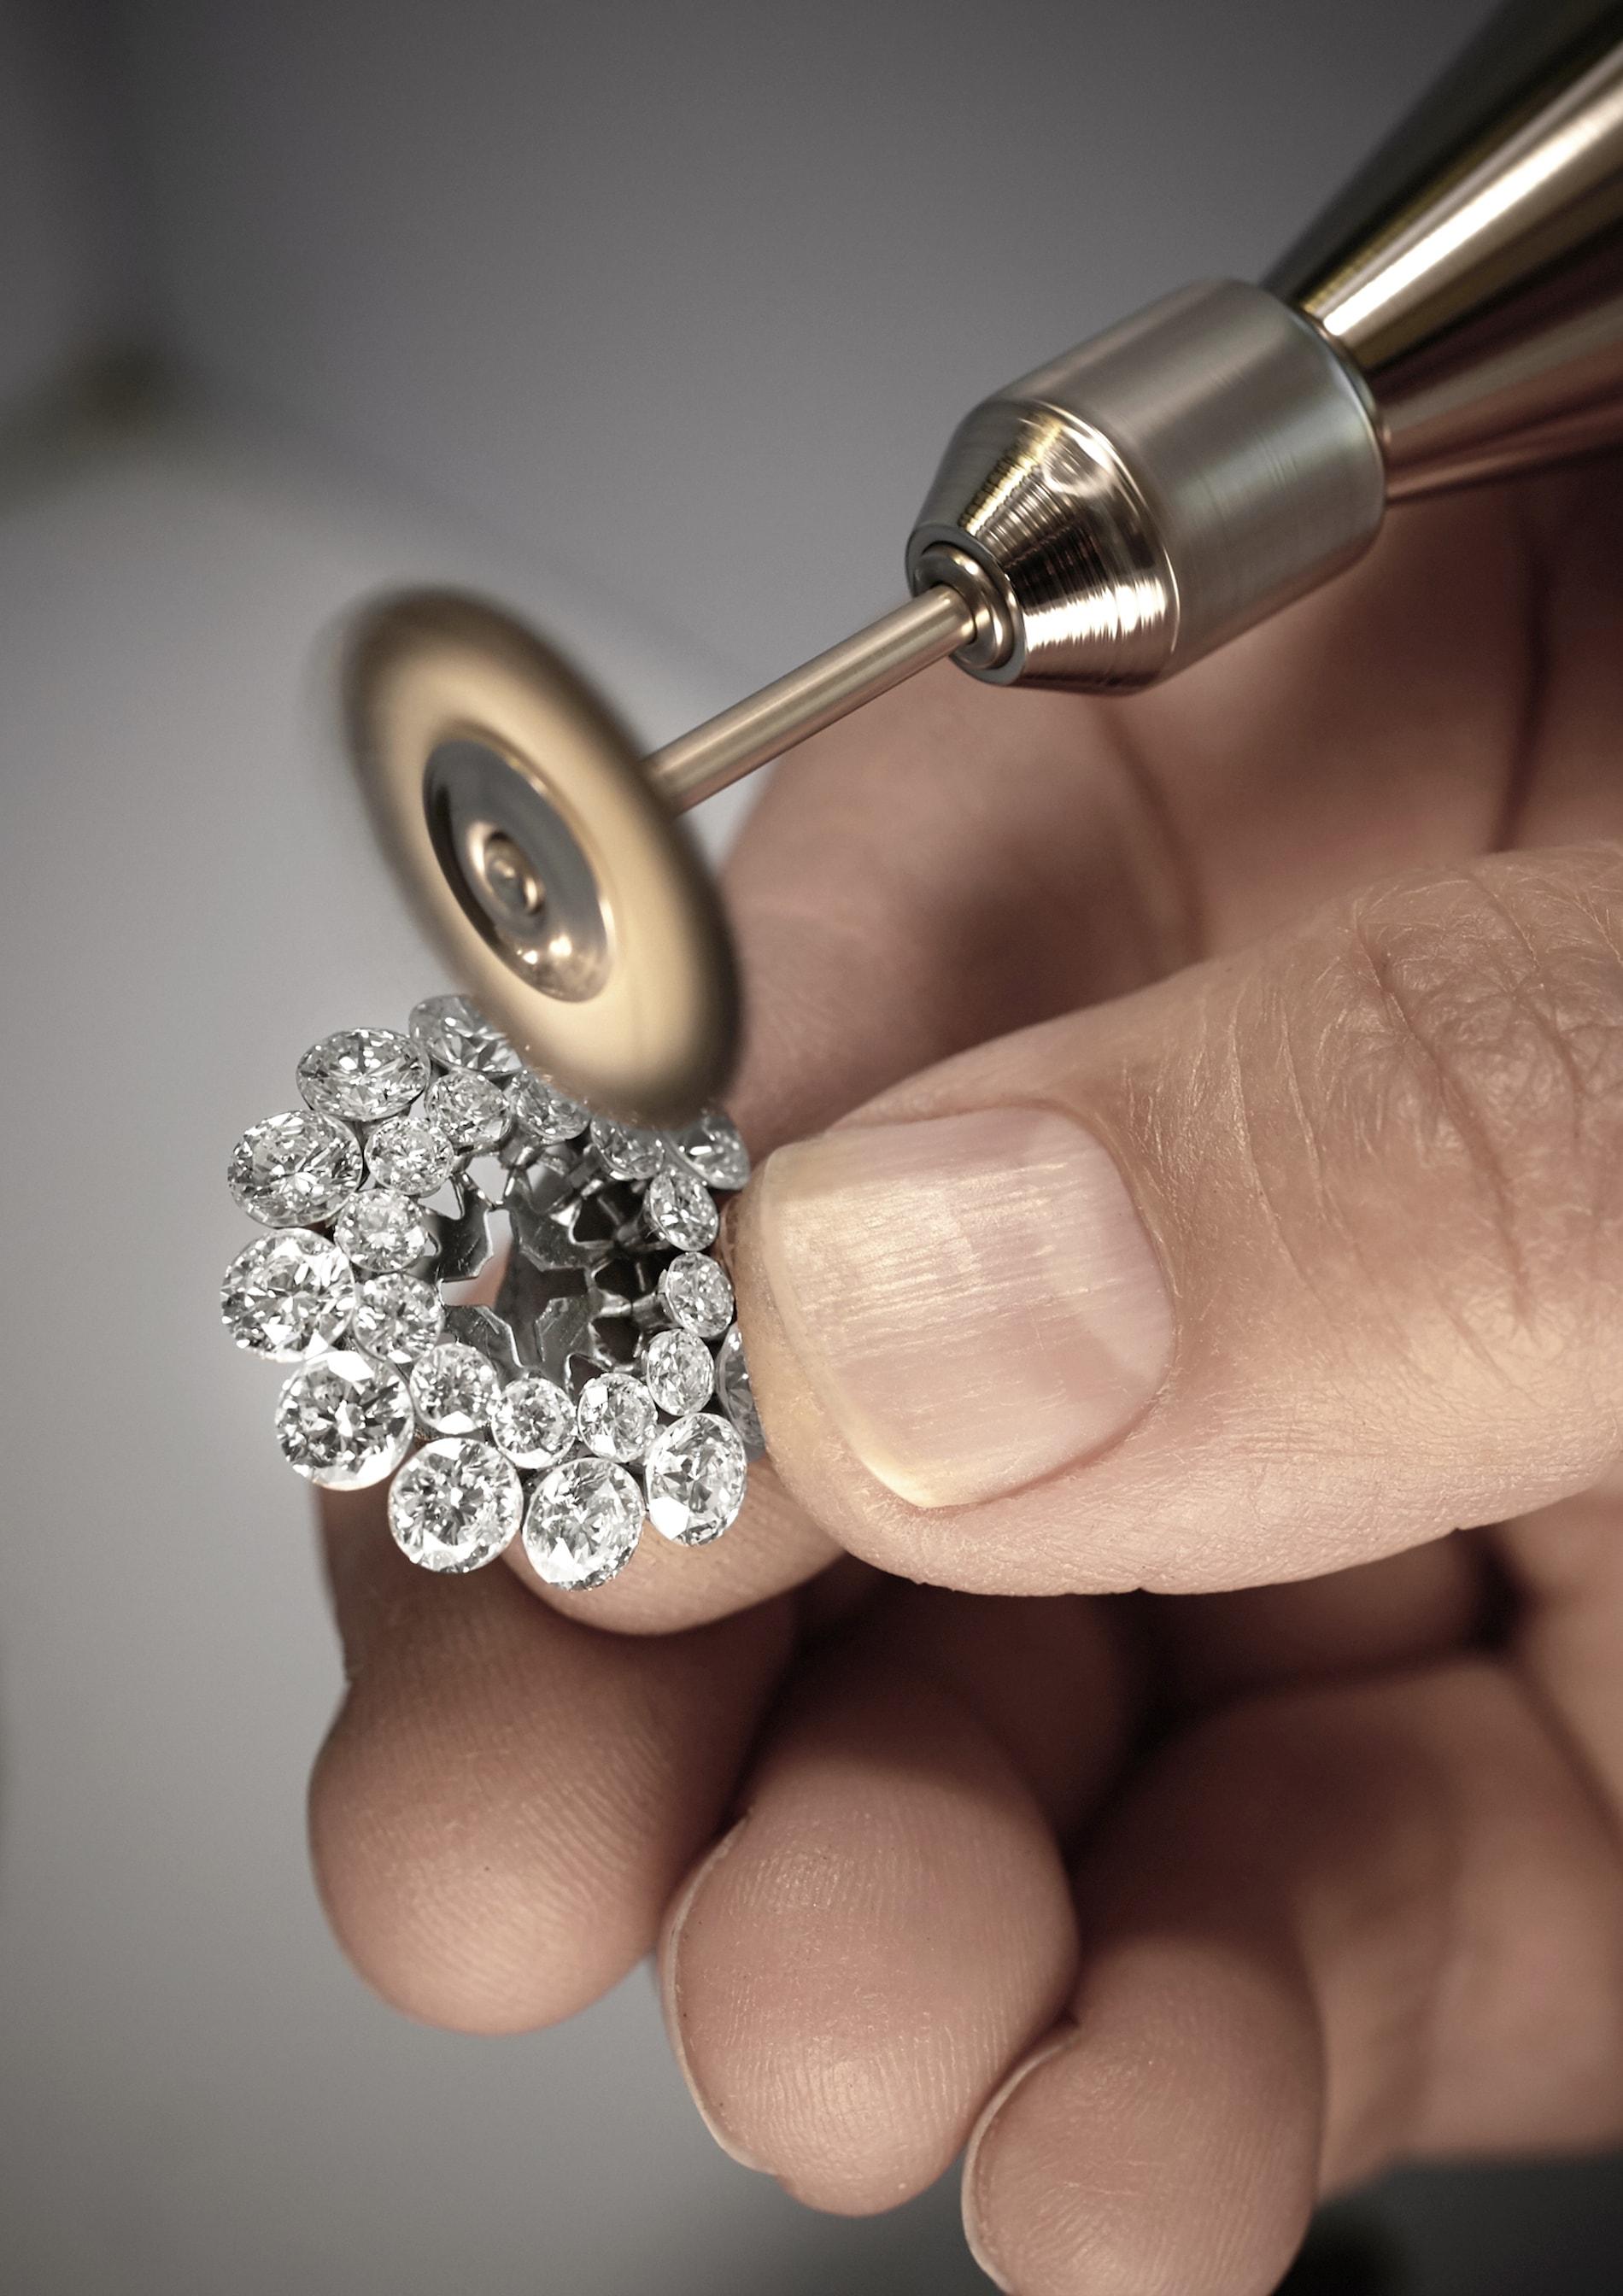 Chopard-Haute-Joaillerie-Magical-Setting-Jewellery-06-min